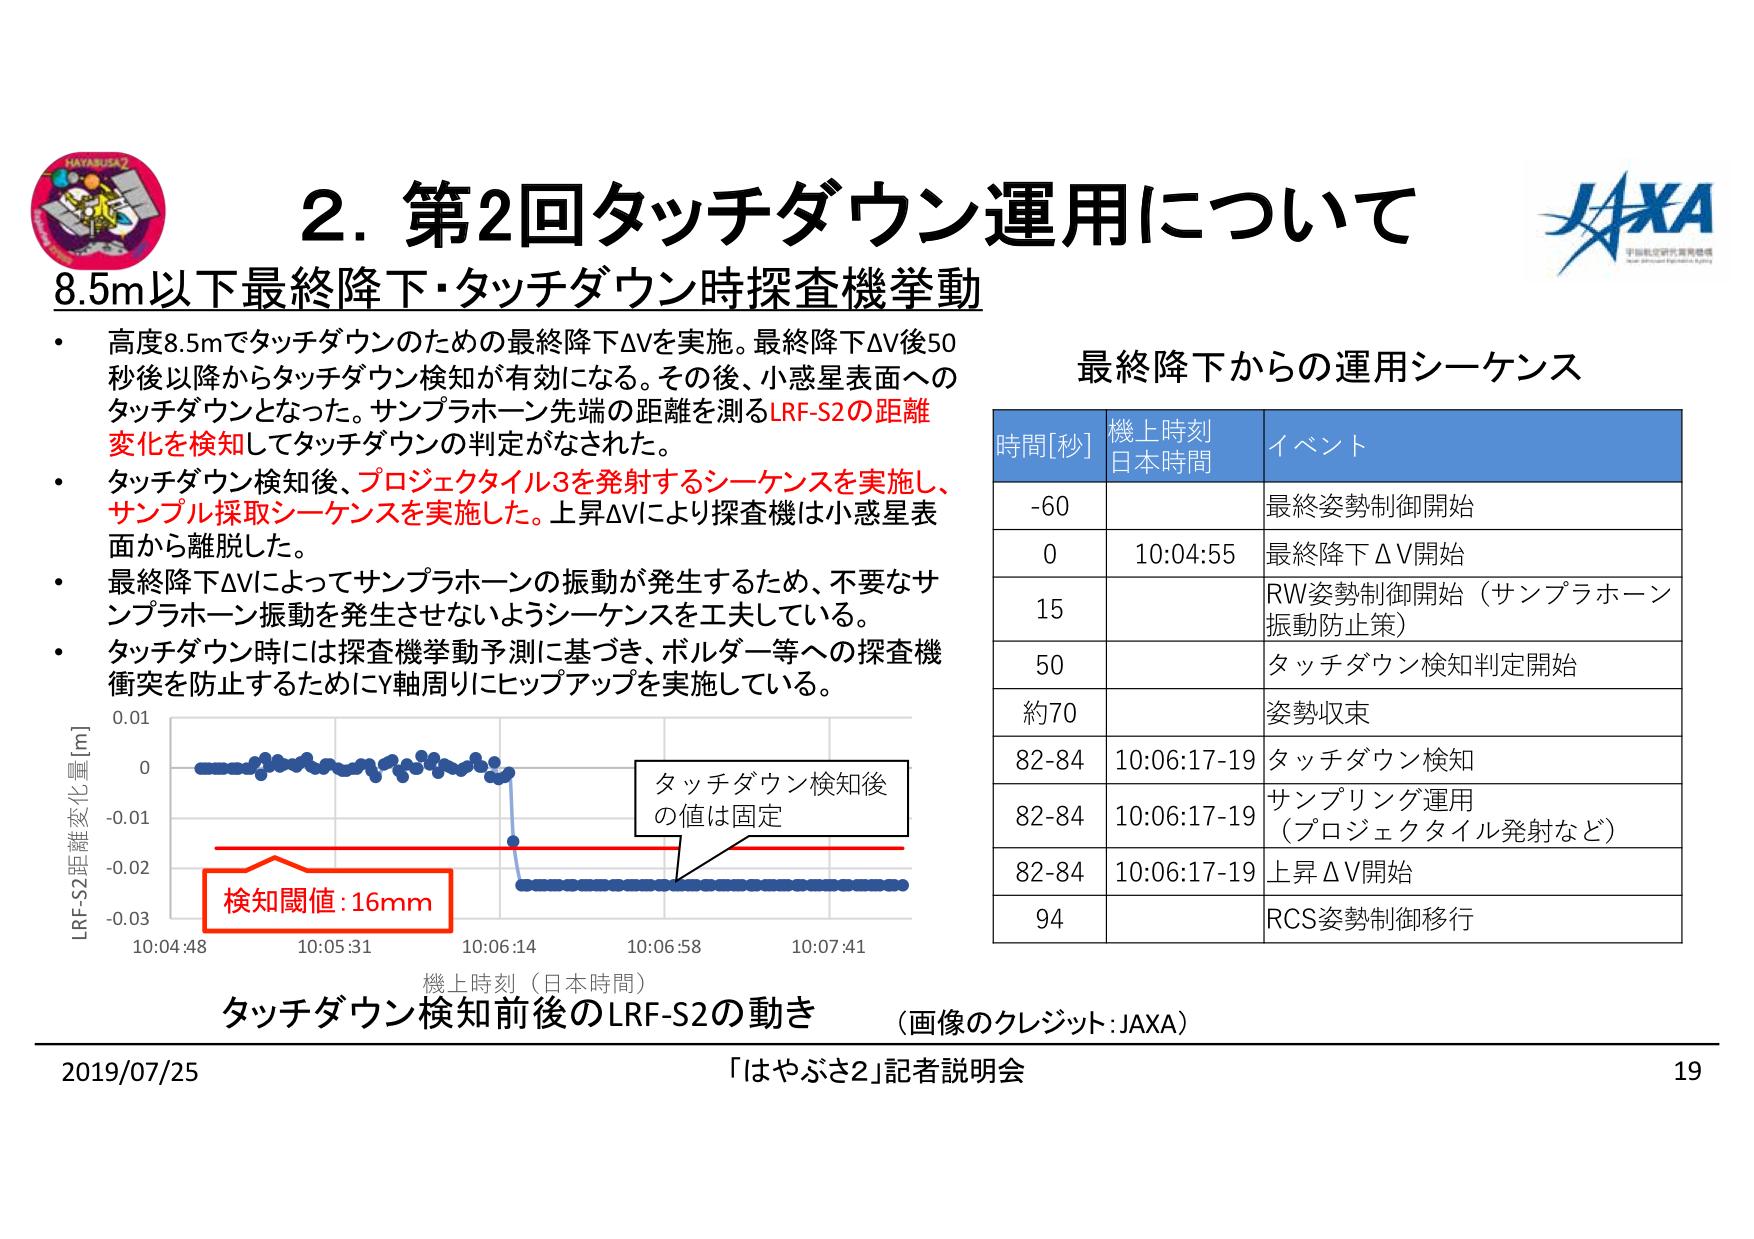 f:id:Imamura:20190725151233p:plain